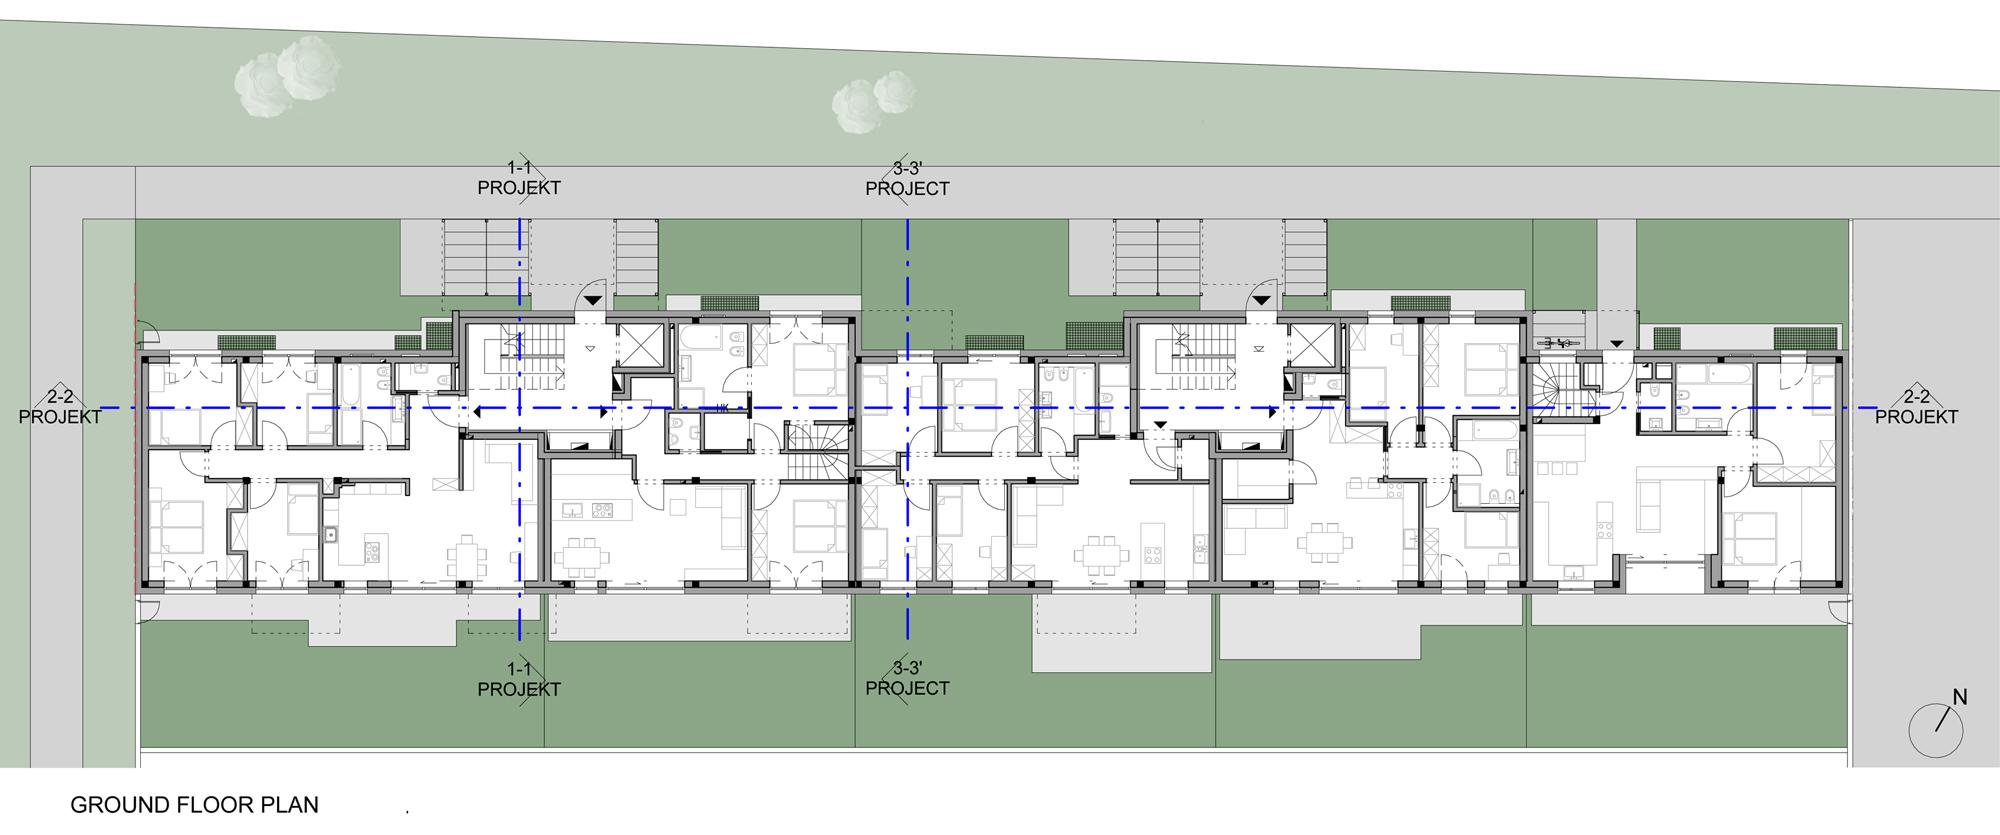 Plan of the Ground Floor }